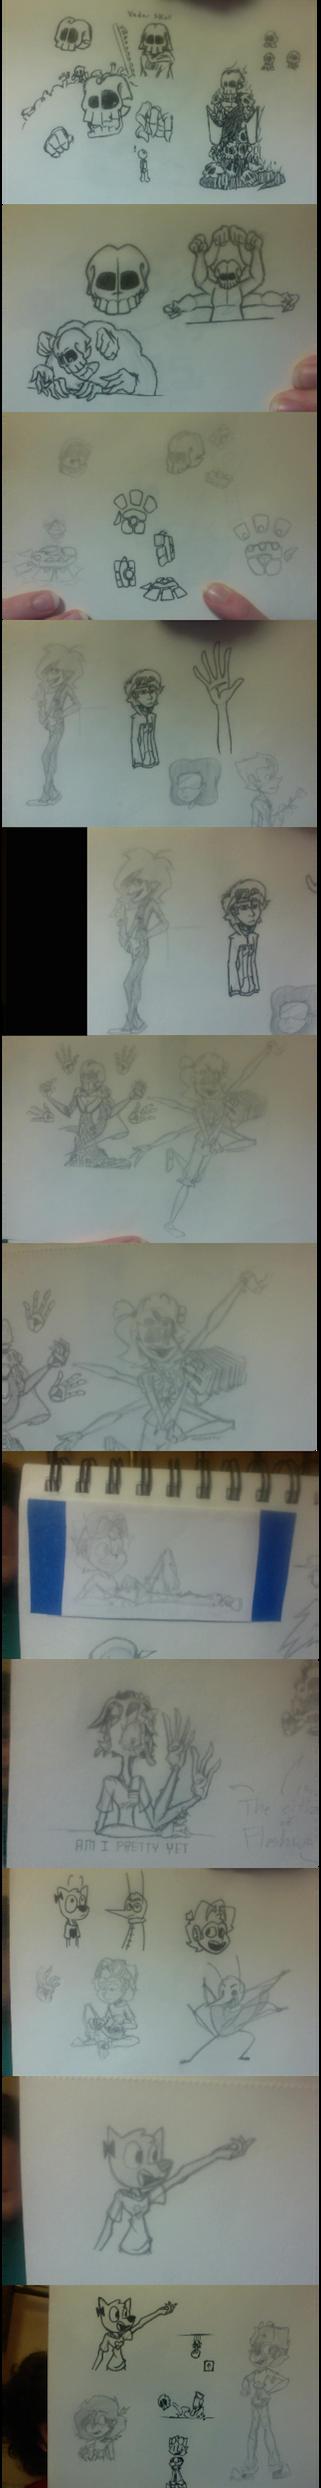 Moar Sketchbook by ToonsByJess